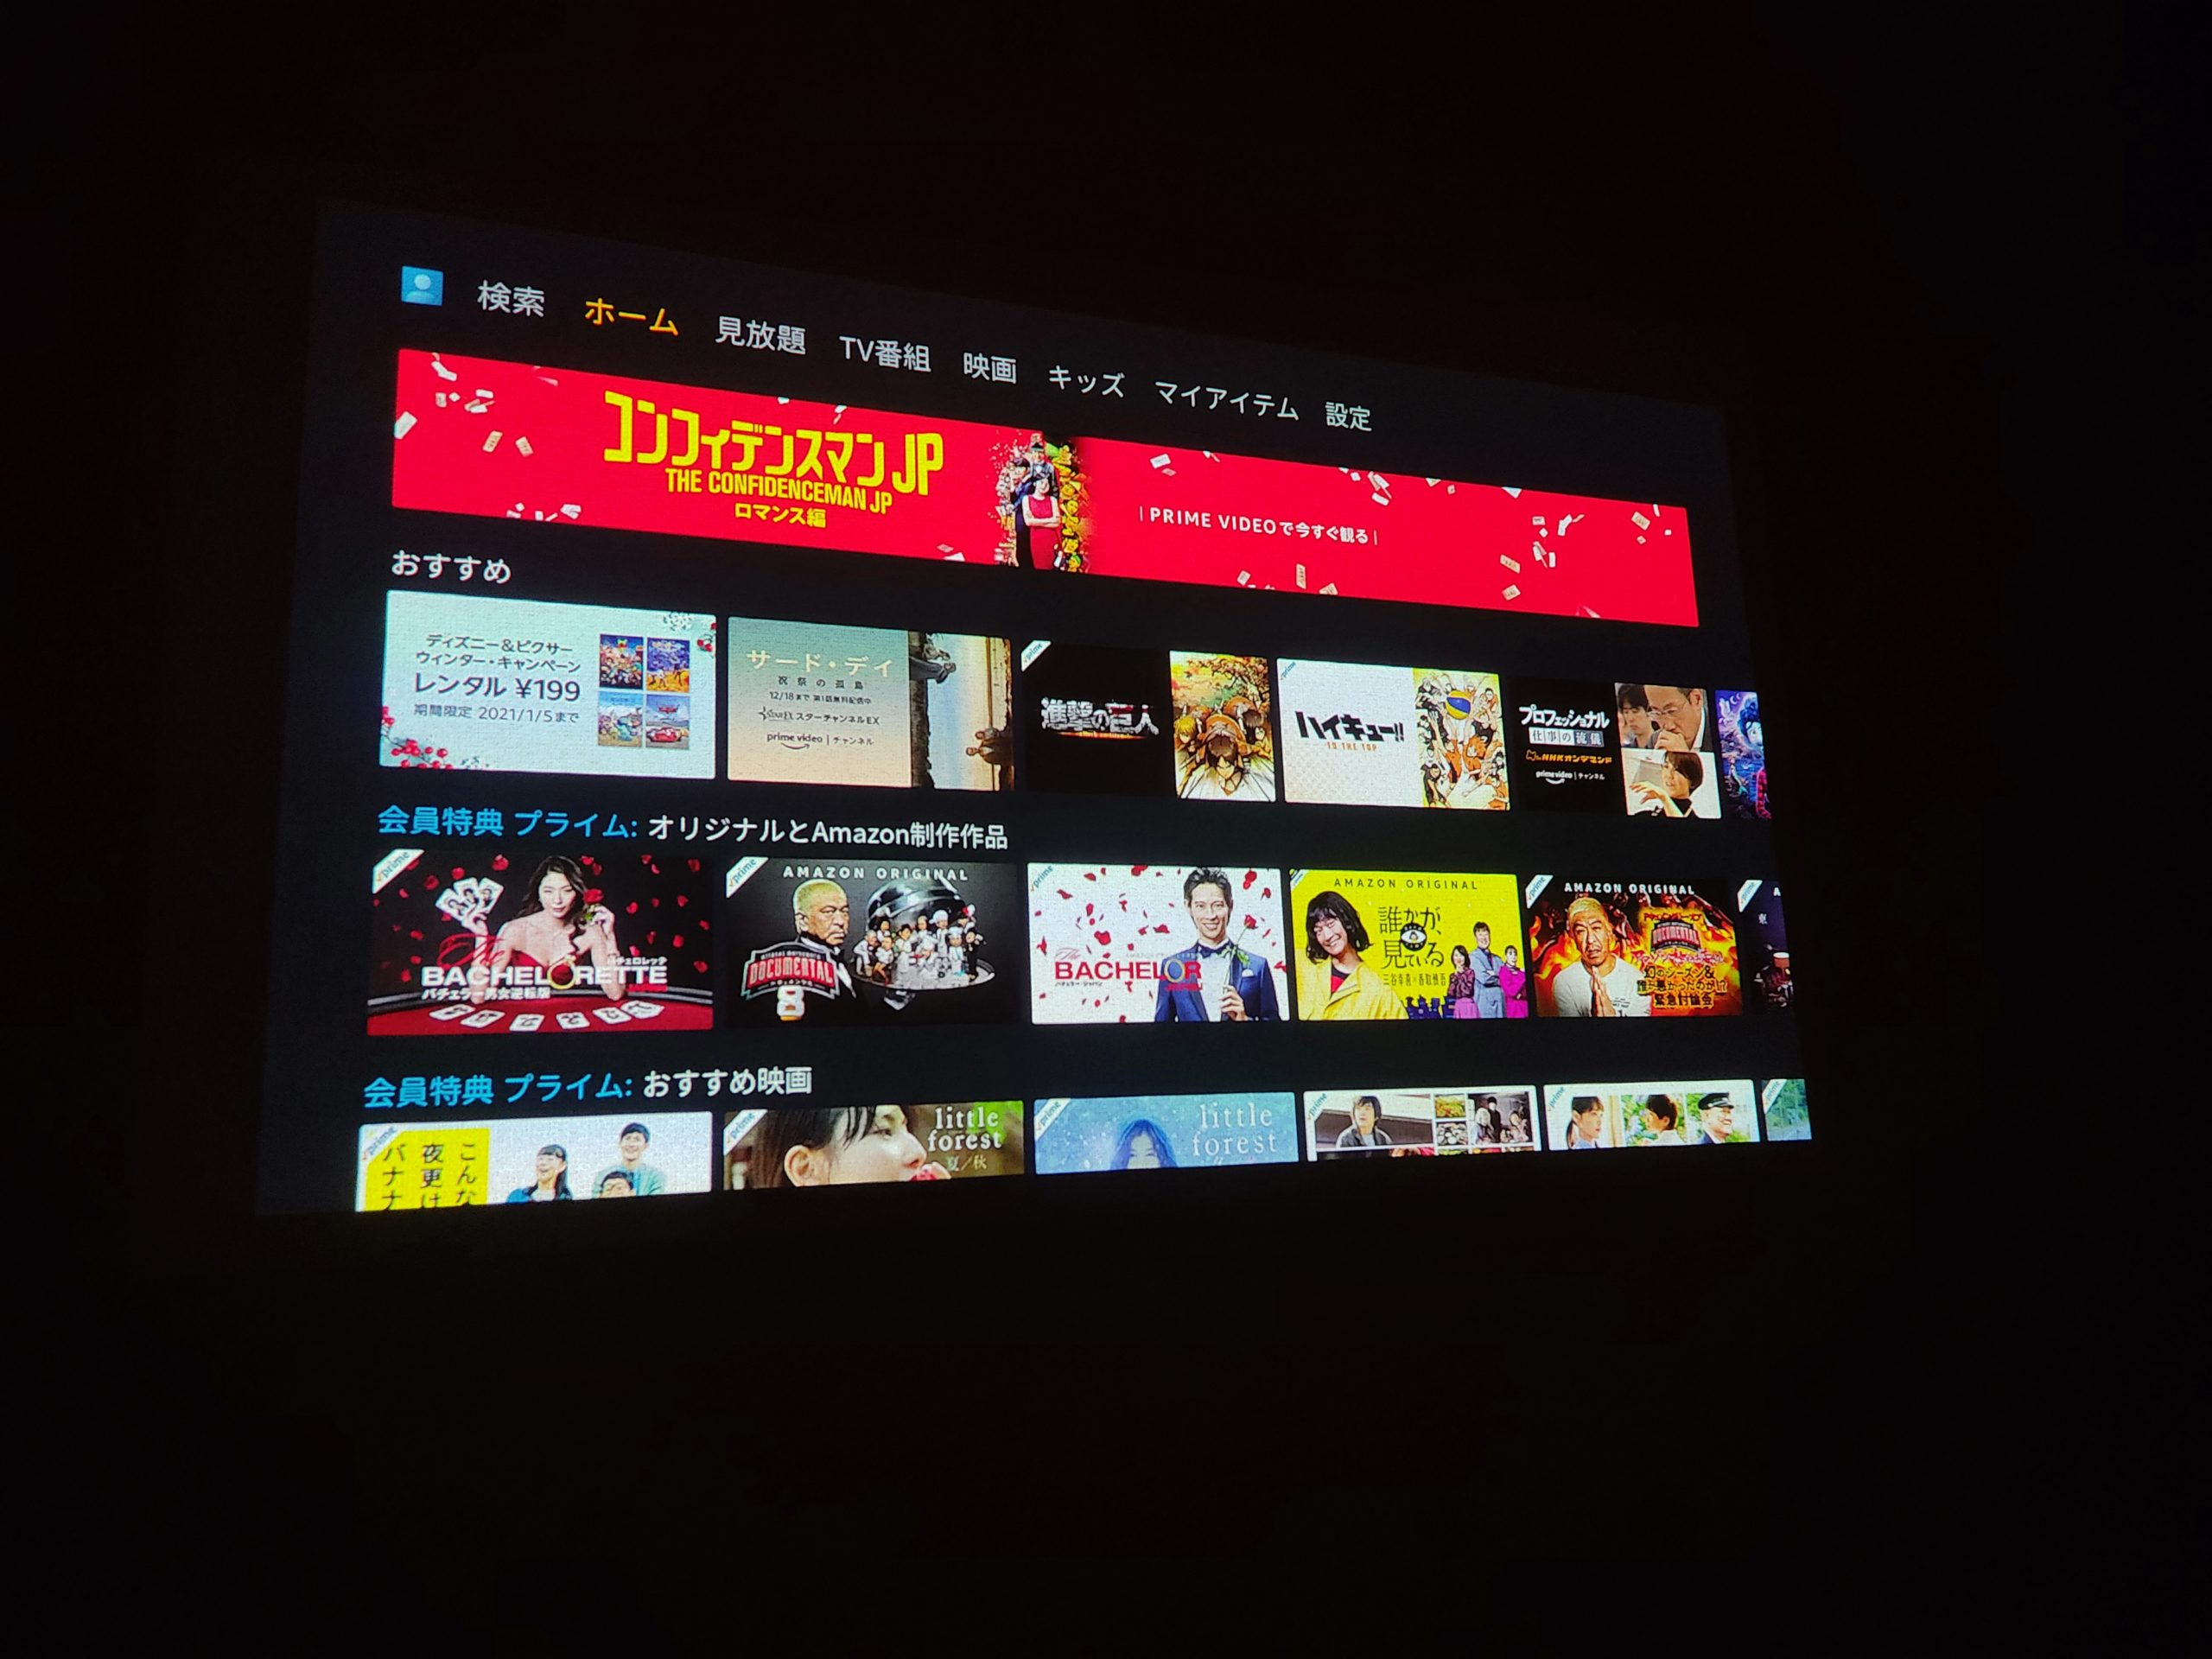 「XGIMI MoGo Pro+」でAmazonプライムビデオを開いた様子